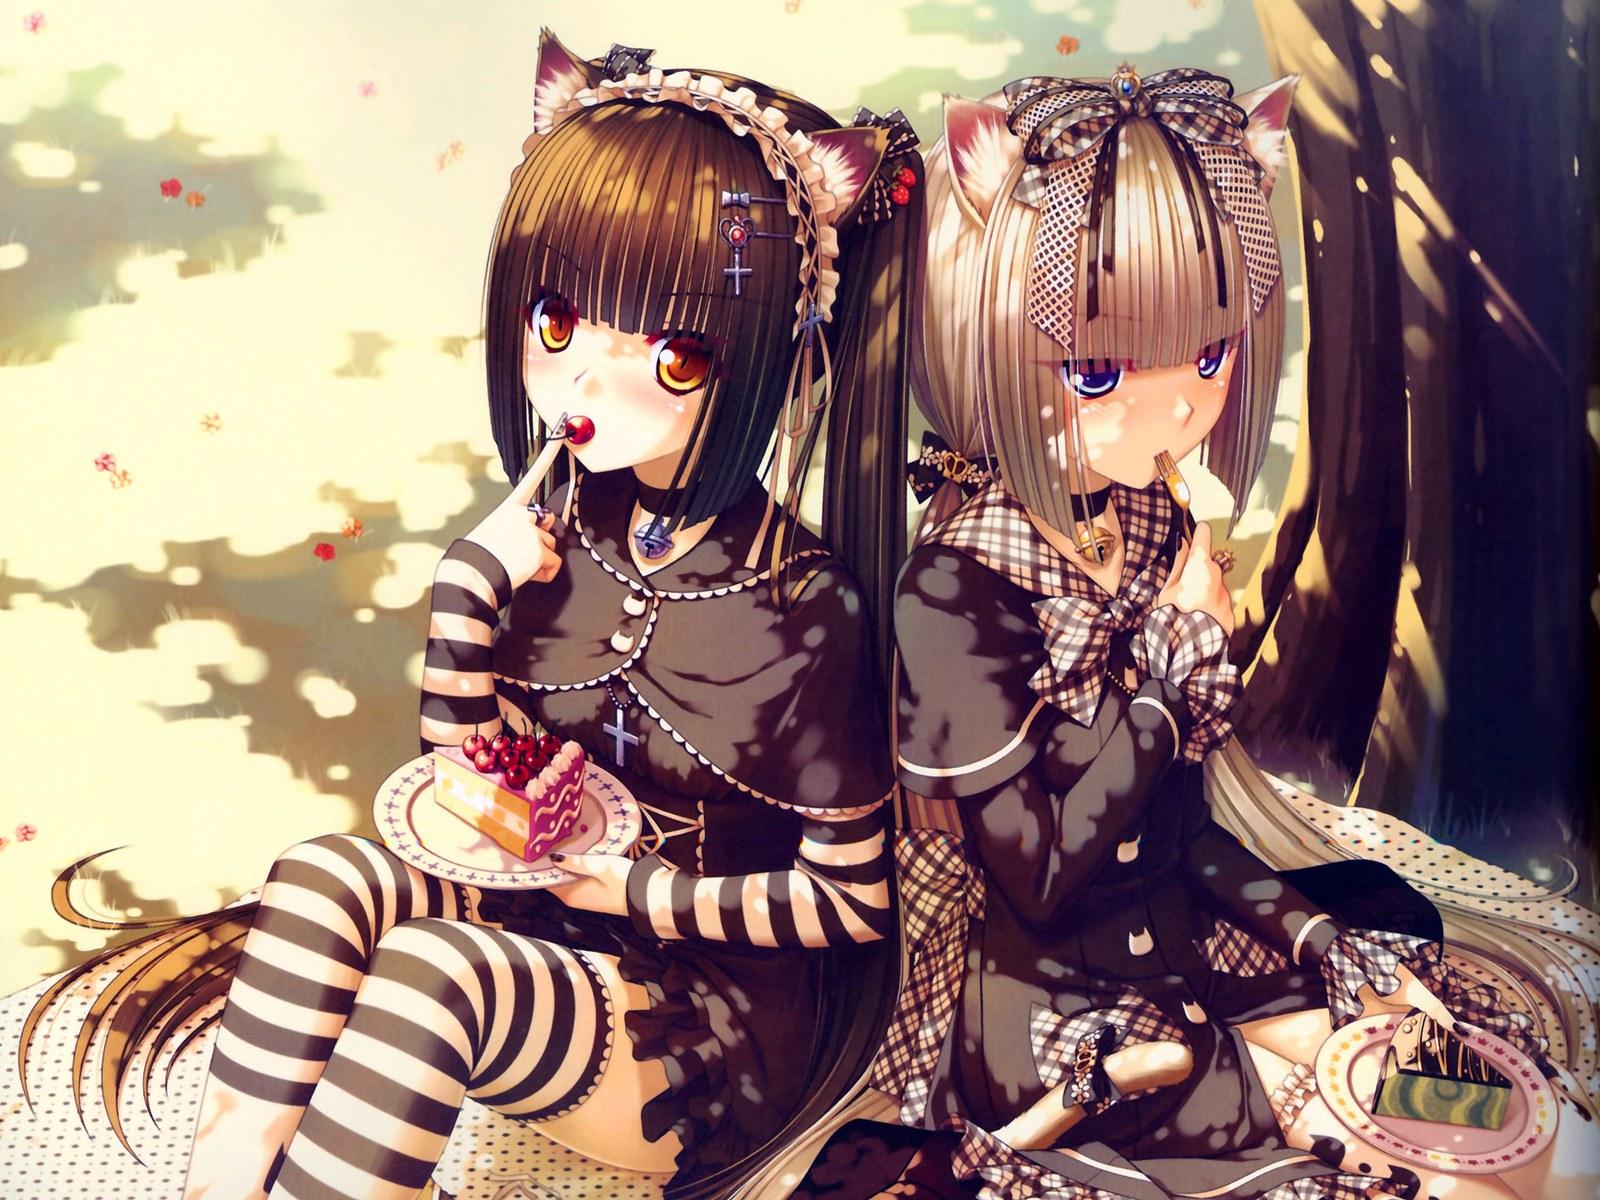 Imagenes de anime girl cute